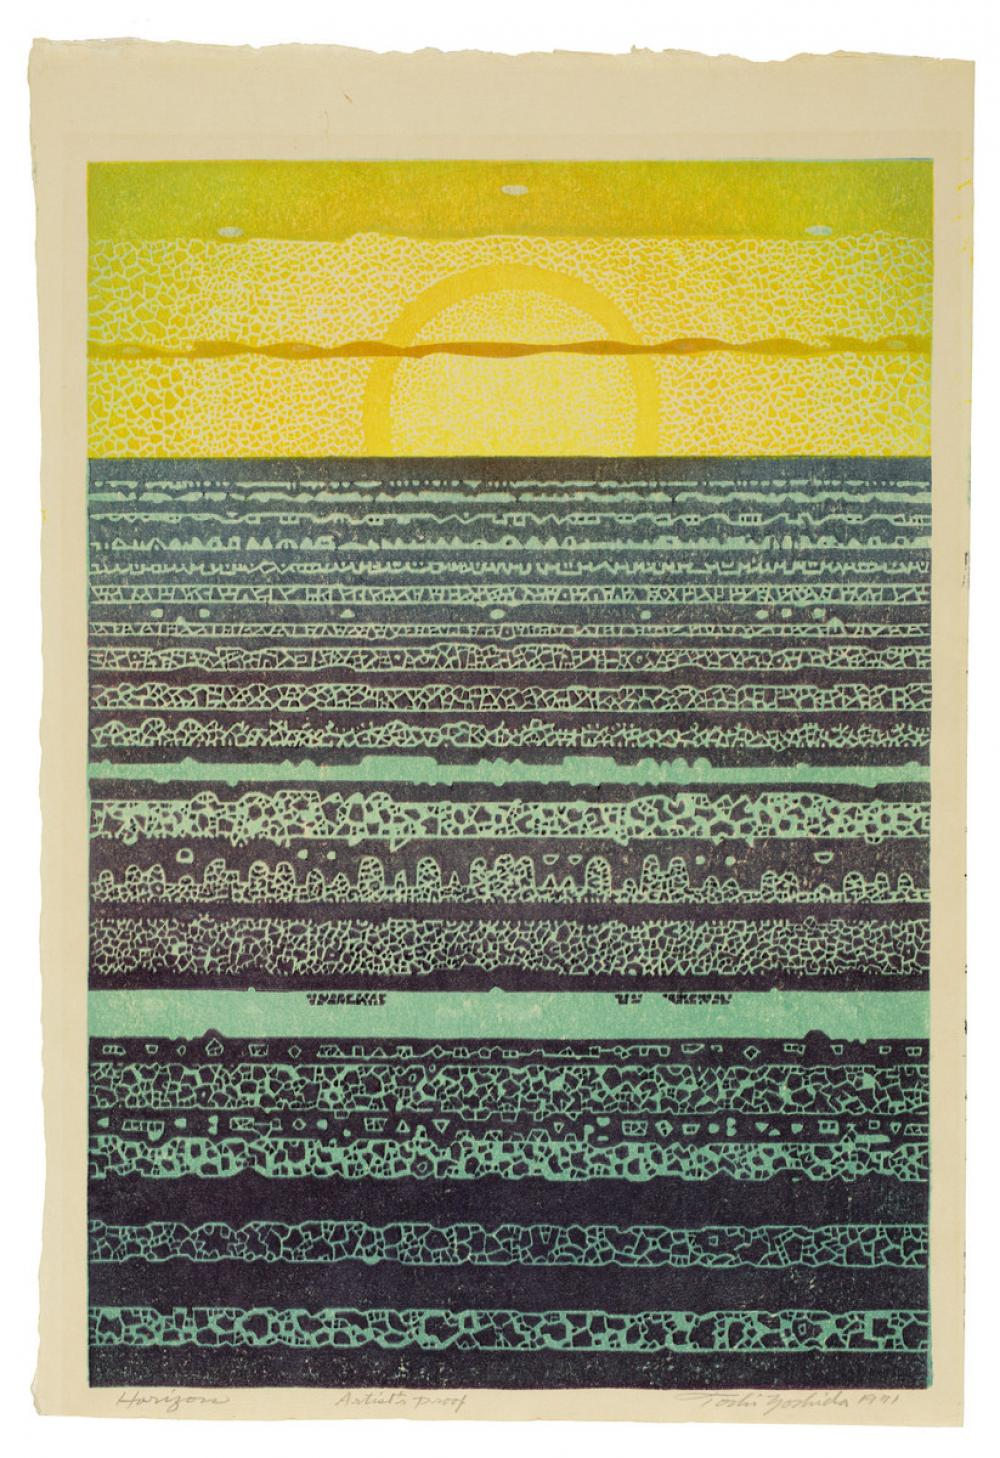 Yoshida Toshi (Japanese, 1911-1995), Horizon, 1970